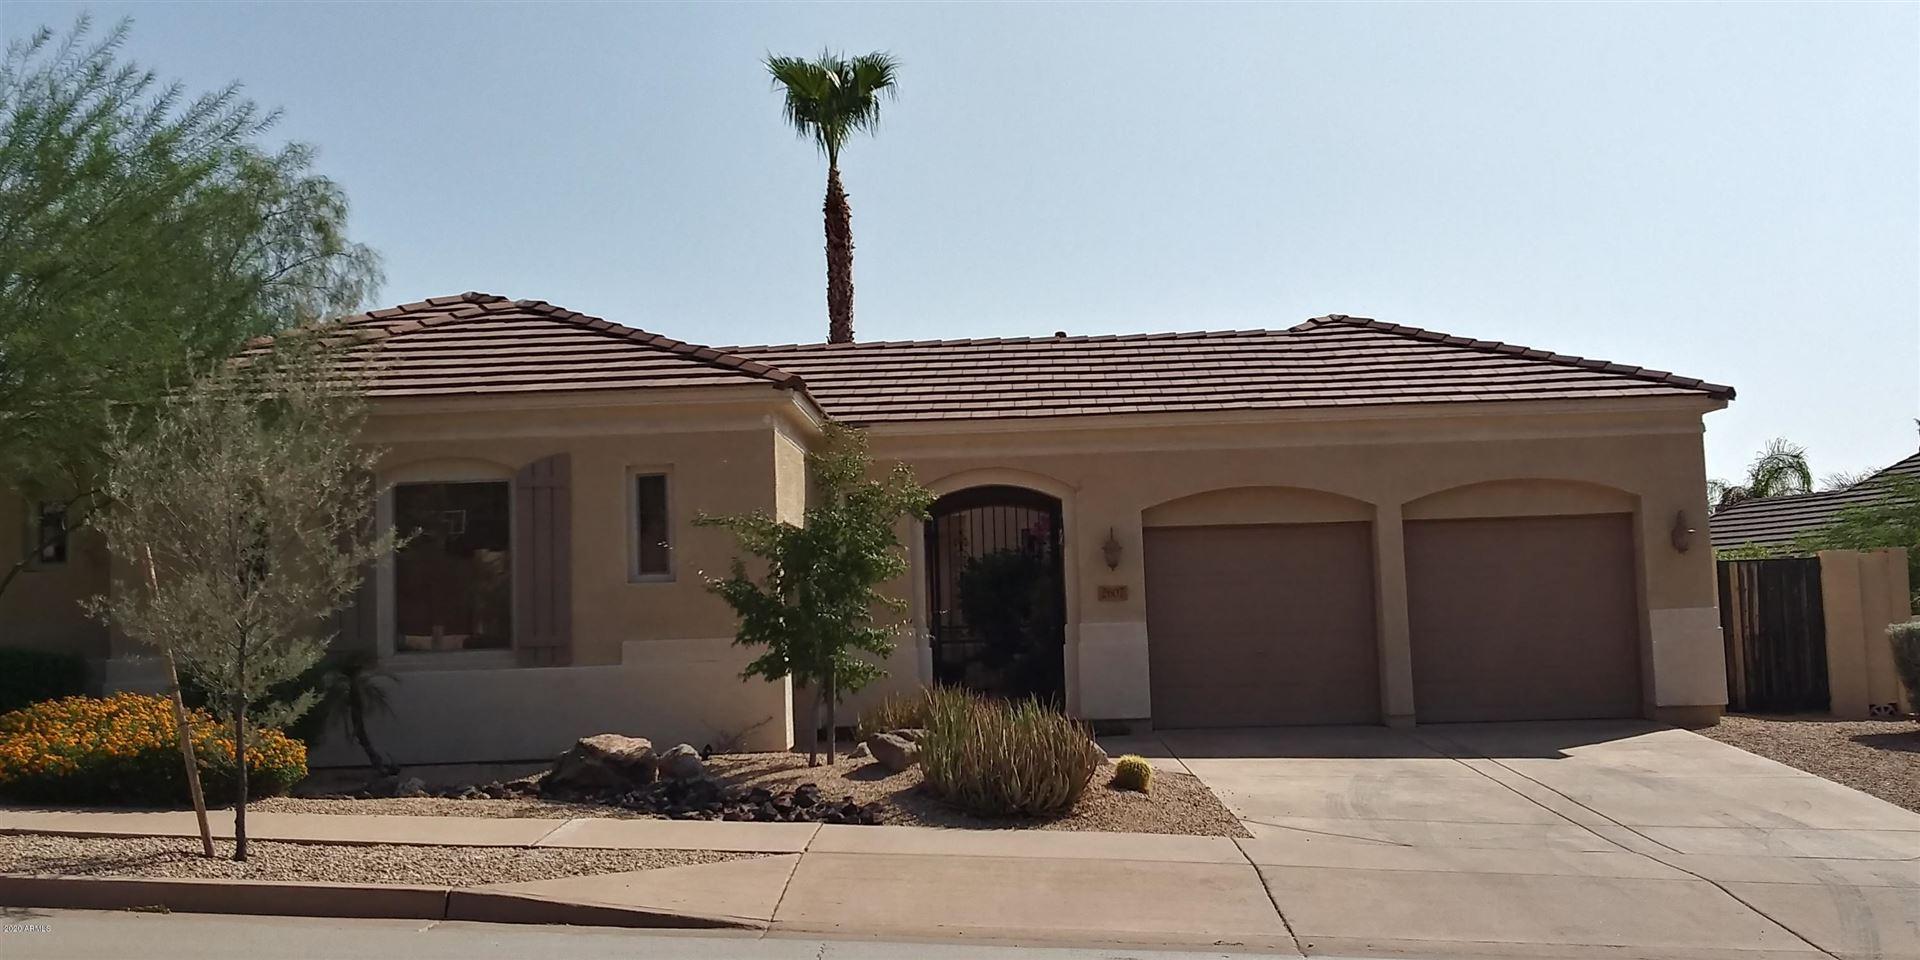 2607 W TRAPANOTTO Road, Phoenix, AZ 85086 - #: 6136569